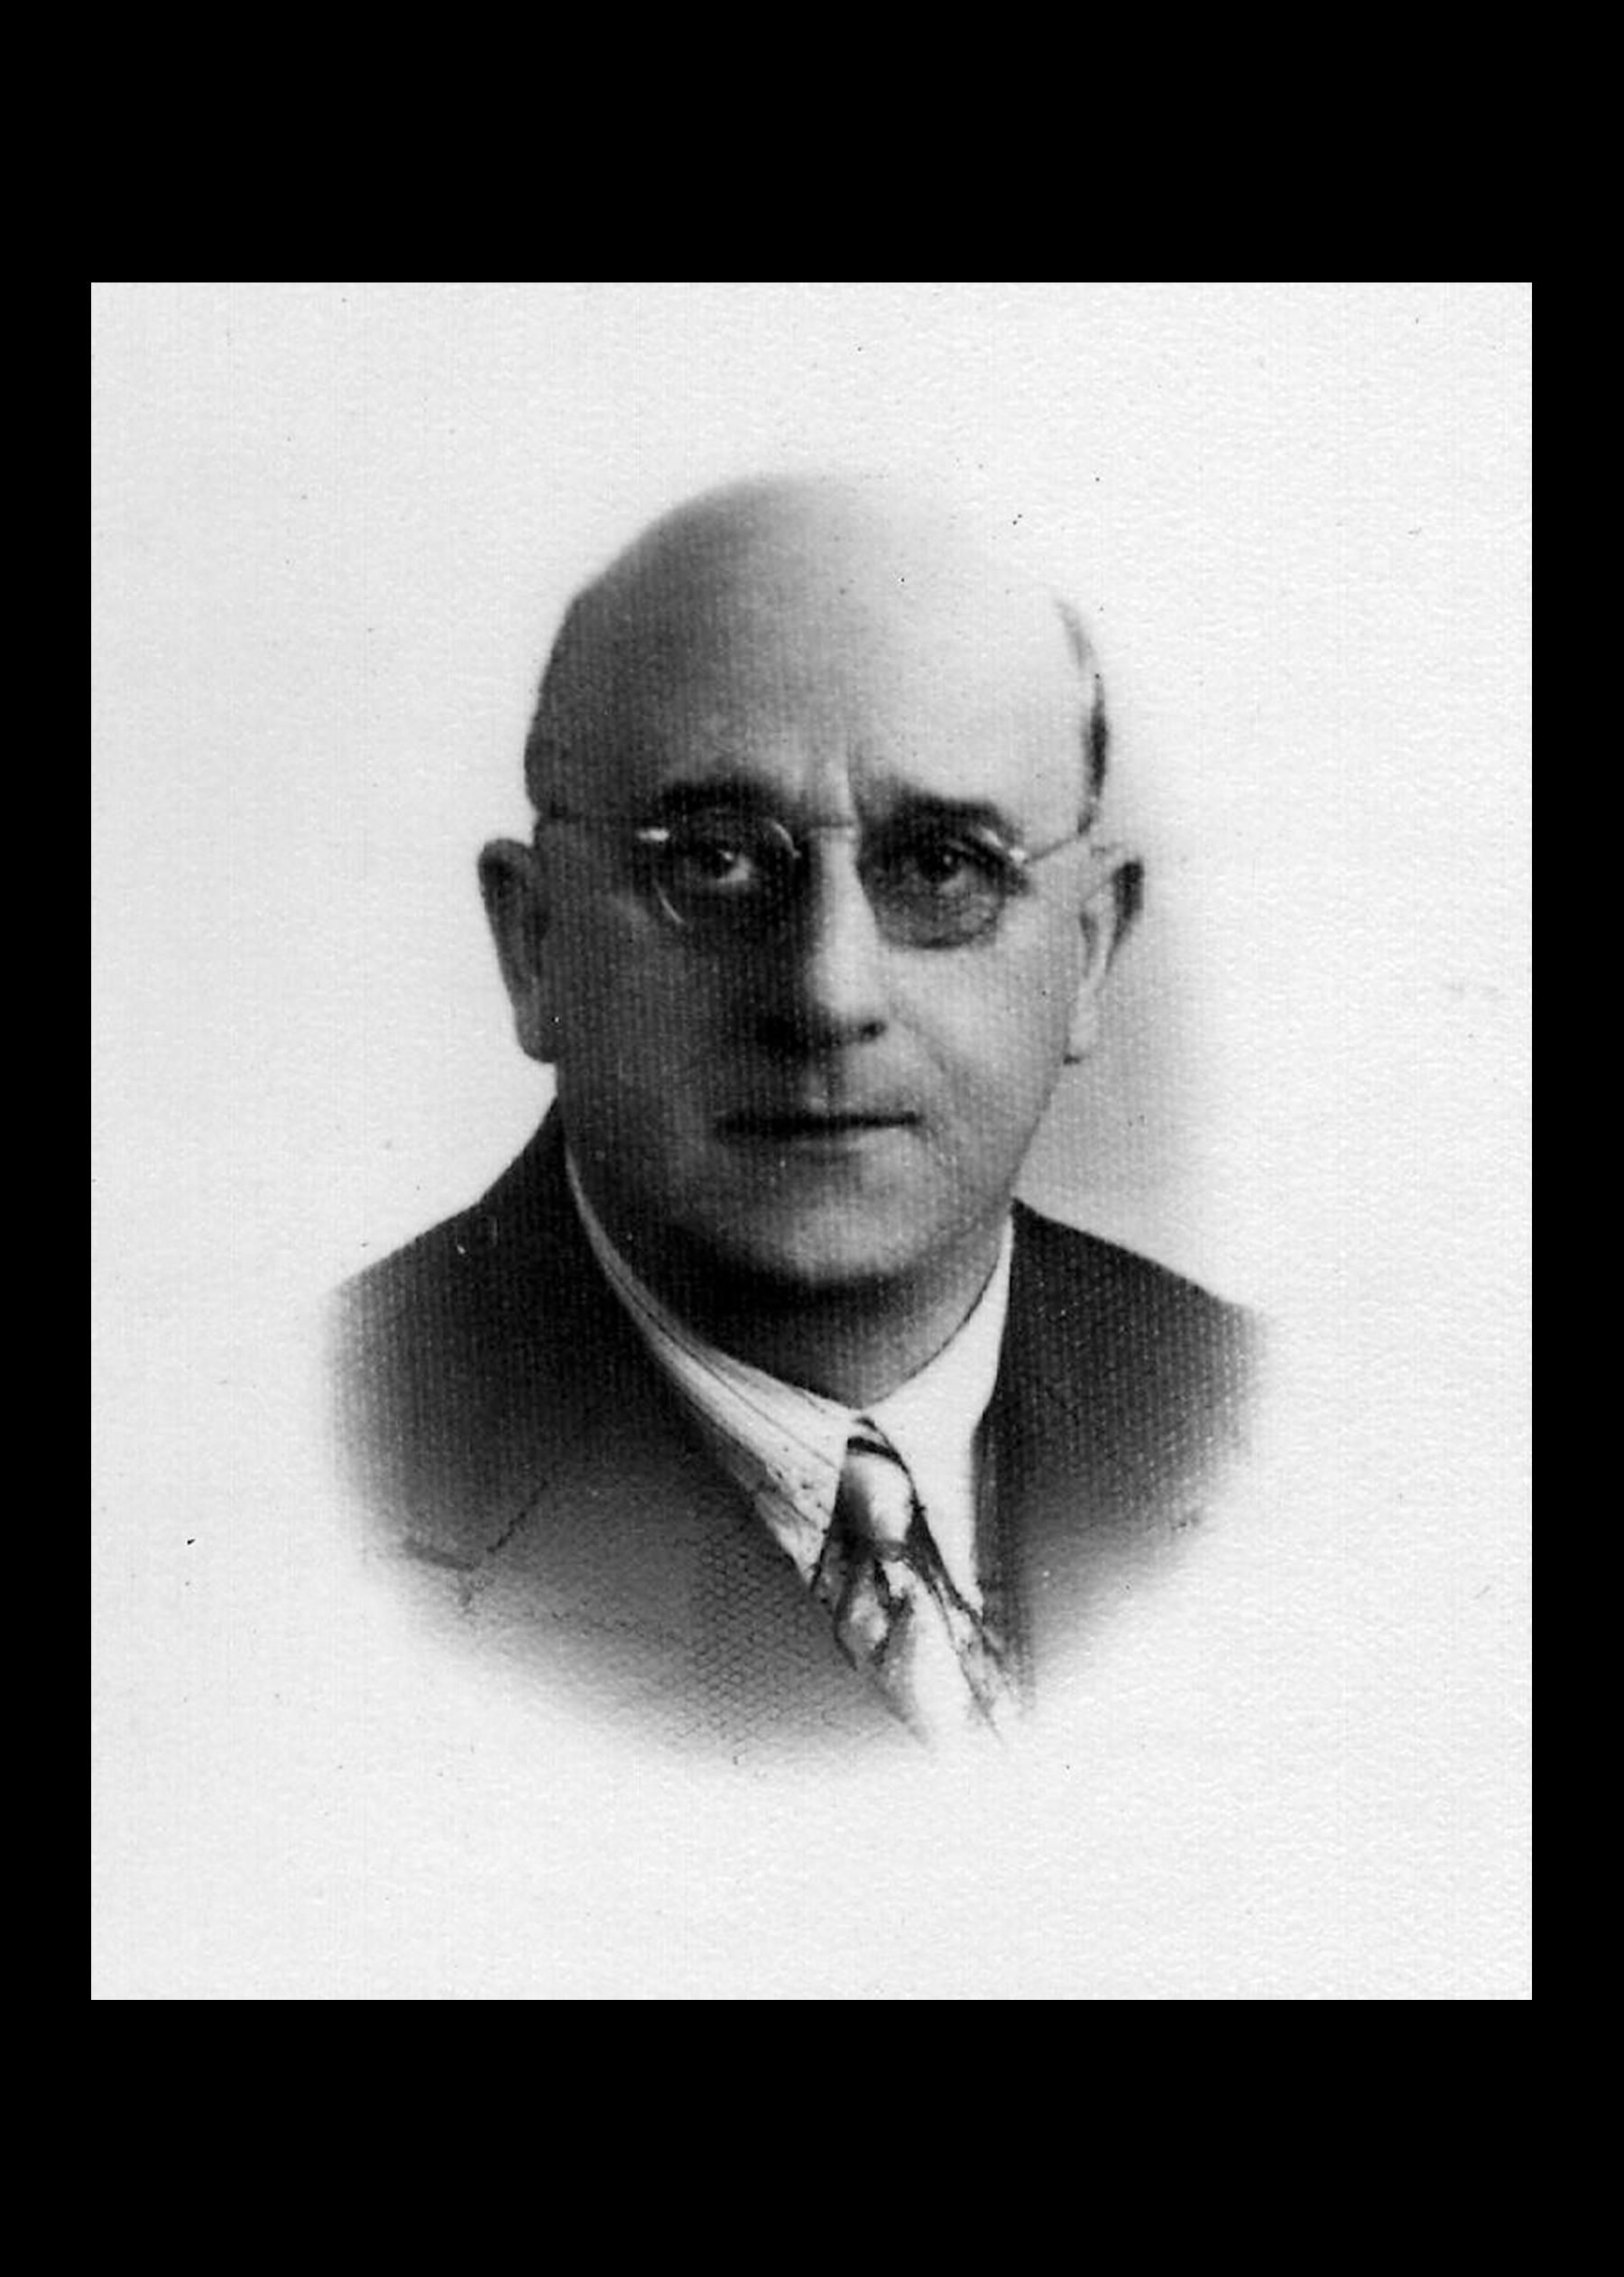 Dott. Guglielmo Biancani